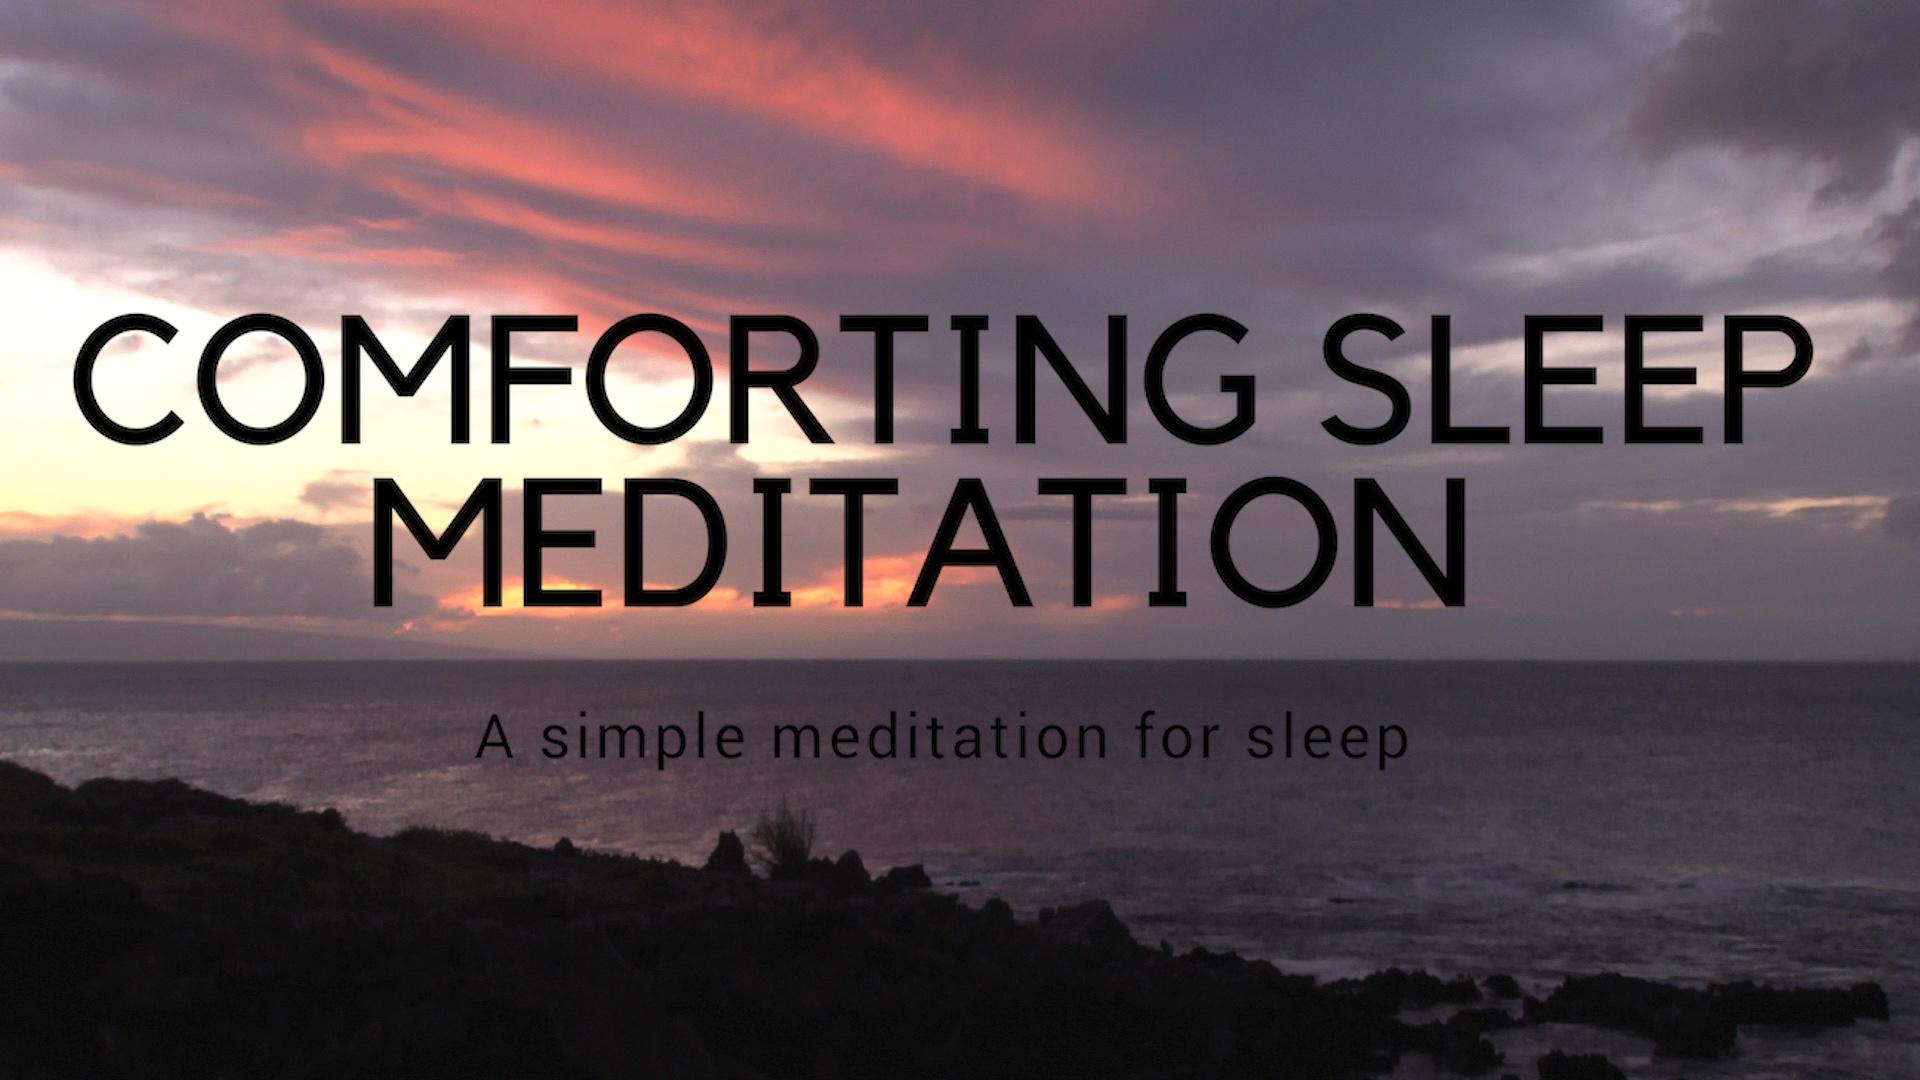 FINAL COMFORTING CALMING SLEEP MEDITATION